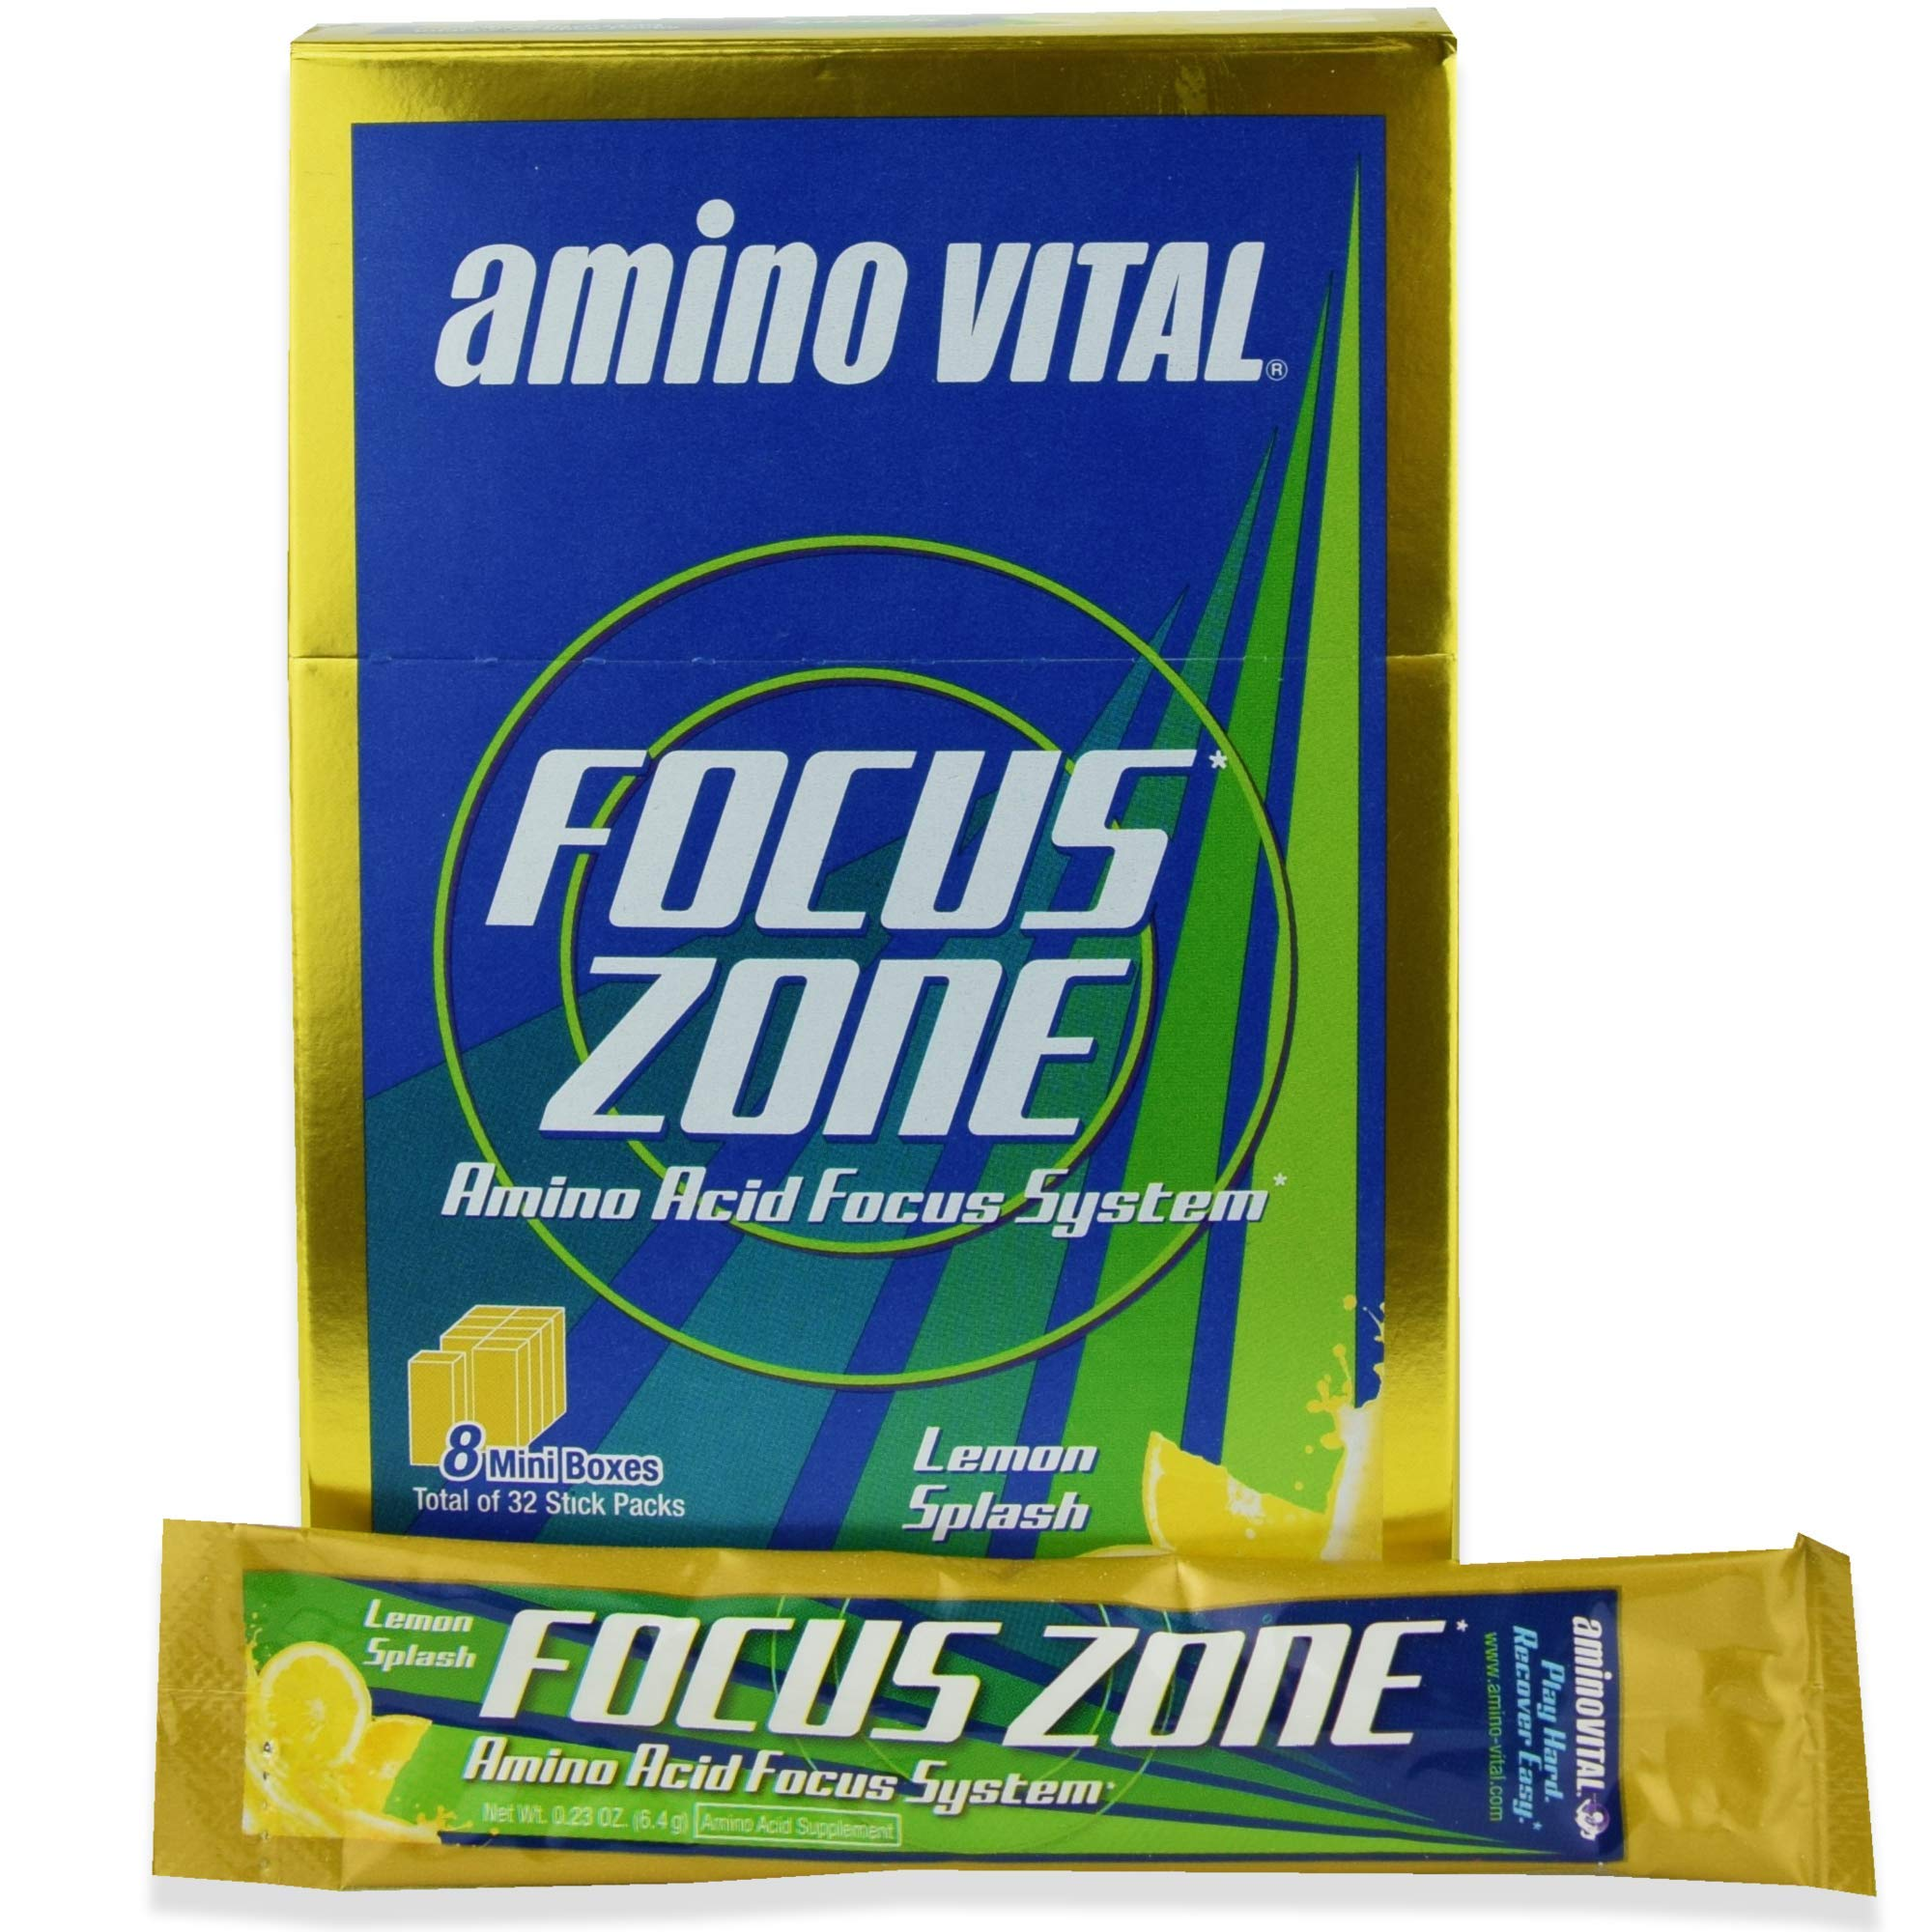 Amino Vital Focus Zone - Amino Acids (BCAAs, Glutamine, Arginine) + Electrolyte Powder Drink Mix, Lemon Splash, 32 x 6.4g Single-Serve Stick Packs, 7.2oz Box